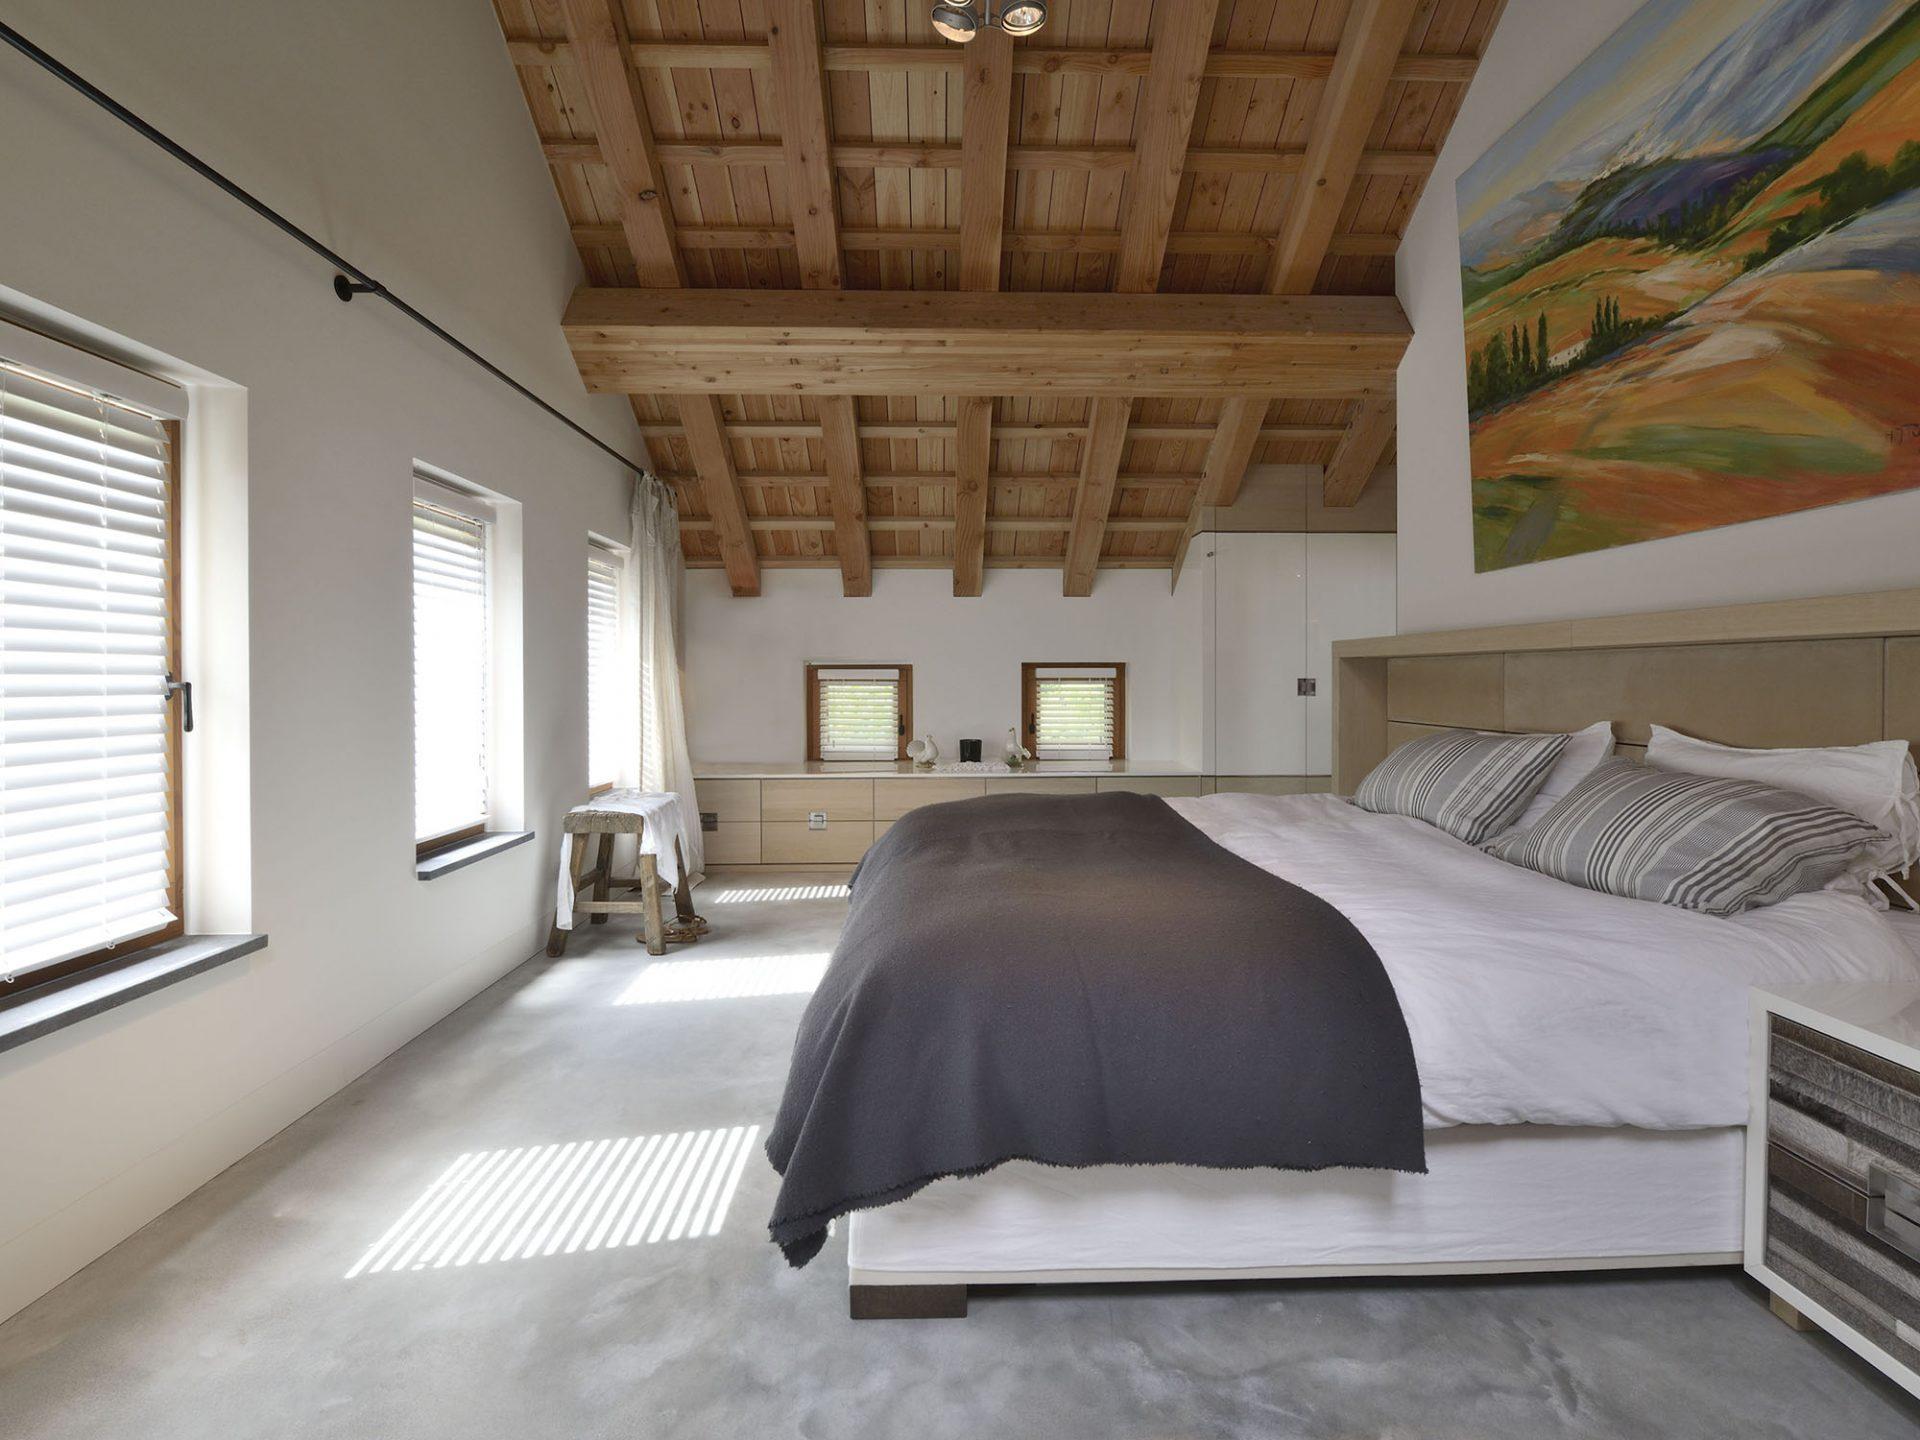 Slaapkamer inrichting: Modern residential living - Emyko